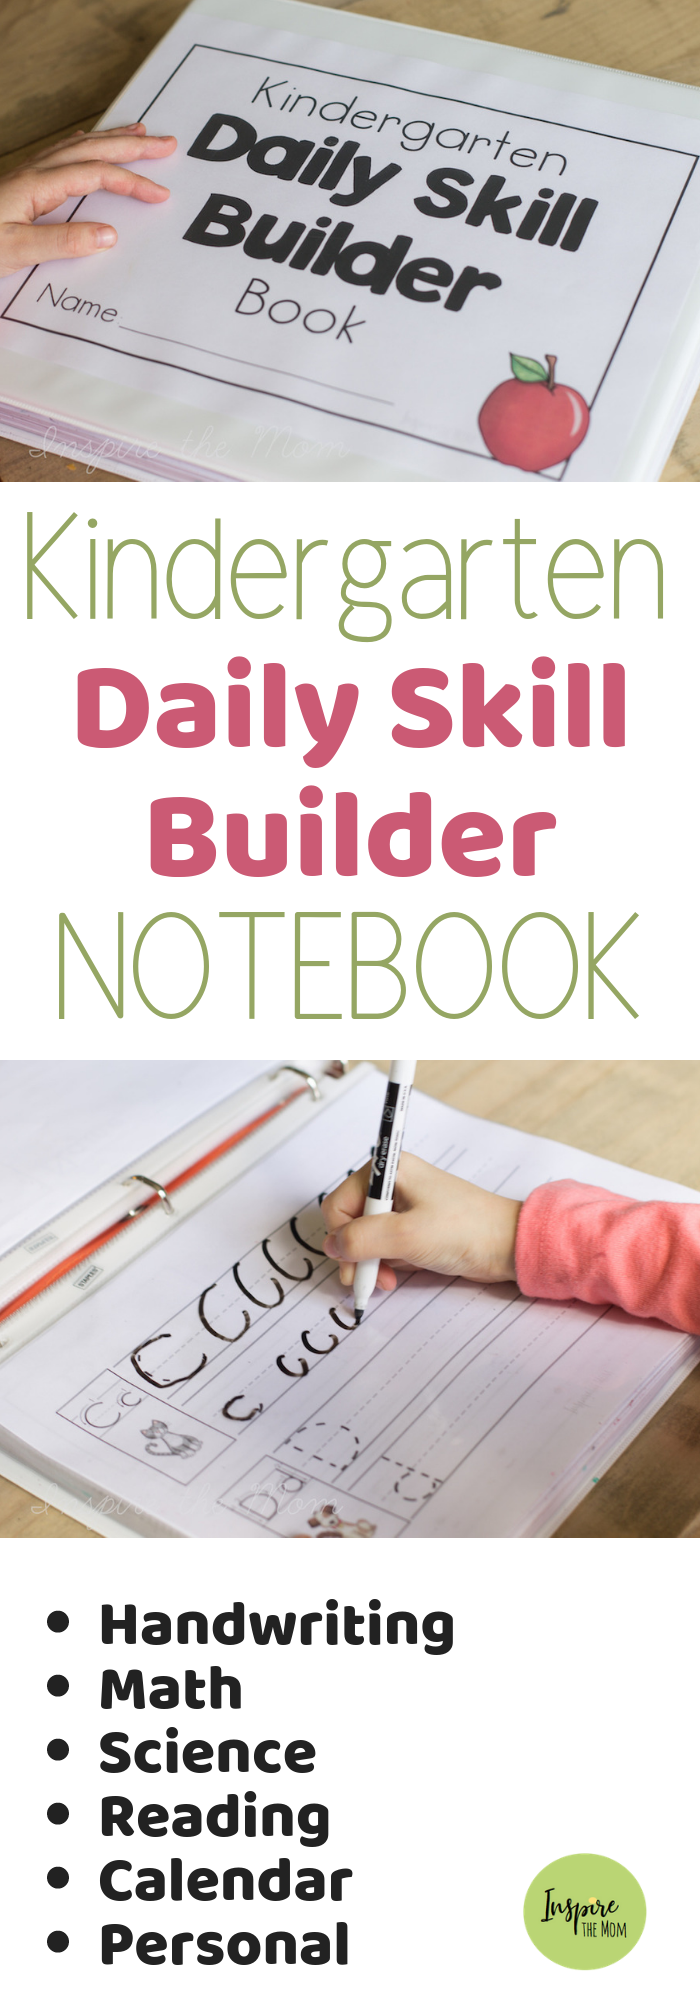 Kindergarten Daily Skill Builder Notebook - Inspire the Mom